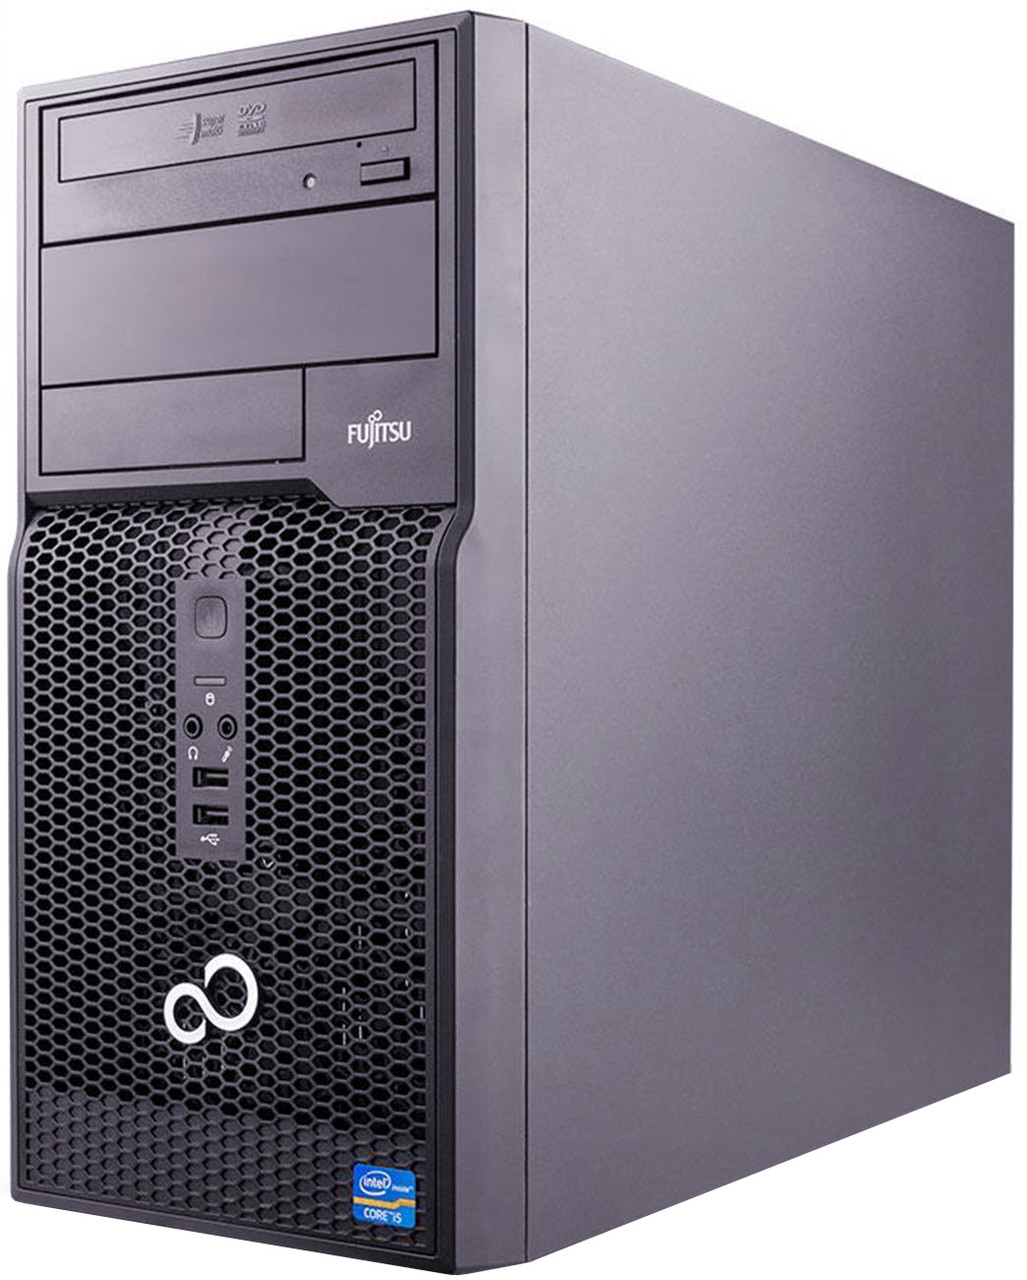 Системный блок Fujitsu ESPRIMO P510-mini tоwer-Intel Core i5-3470-3.2GHz-4Gb-DDR3-HDD-320Gb-DVD-R- Б